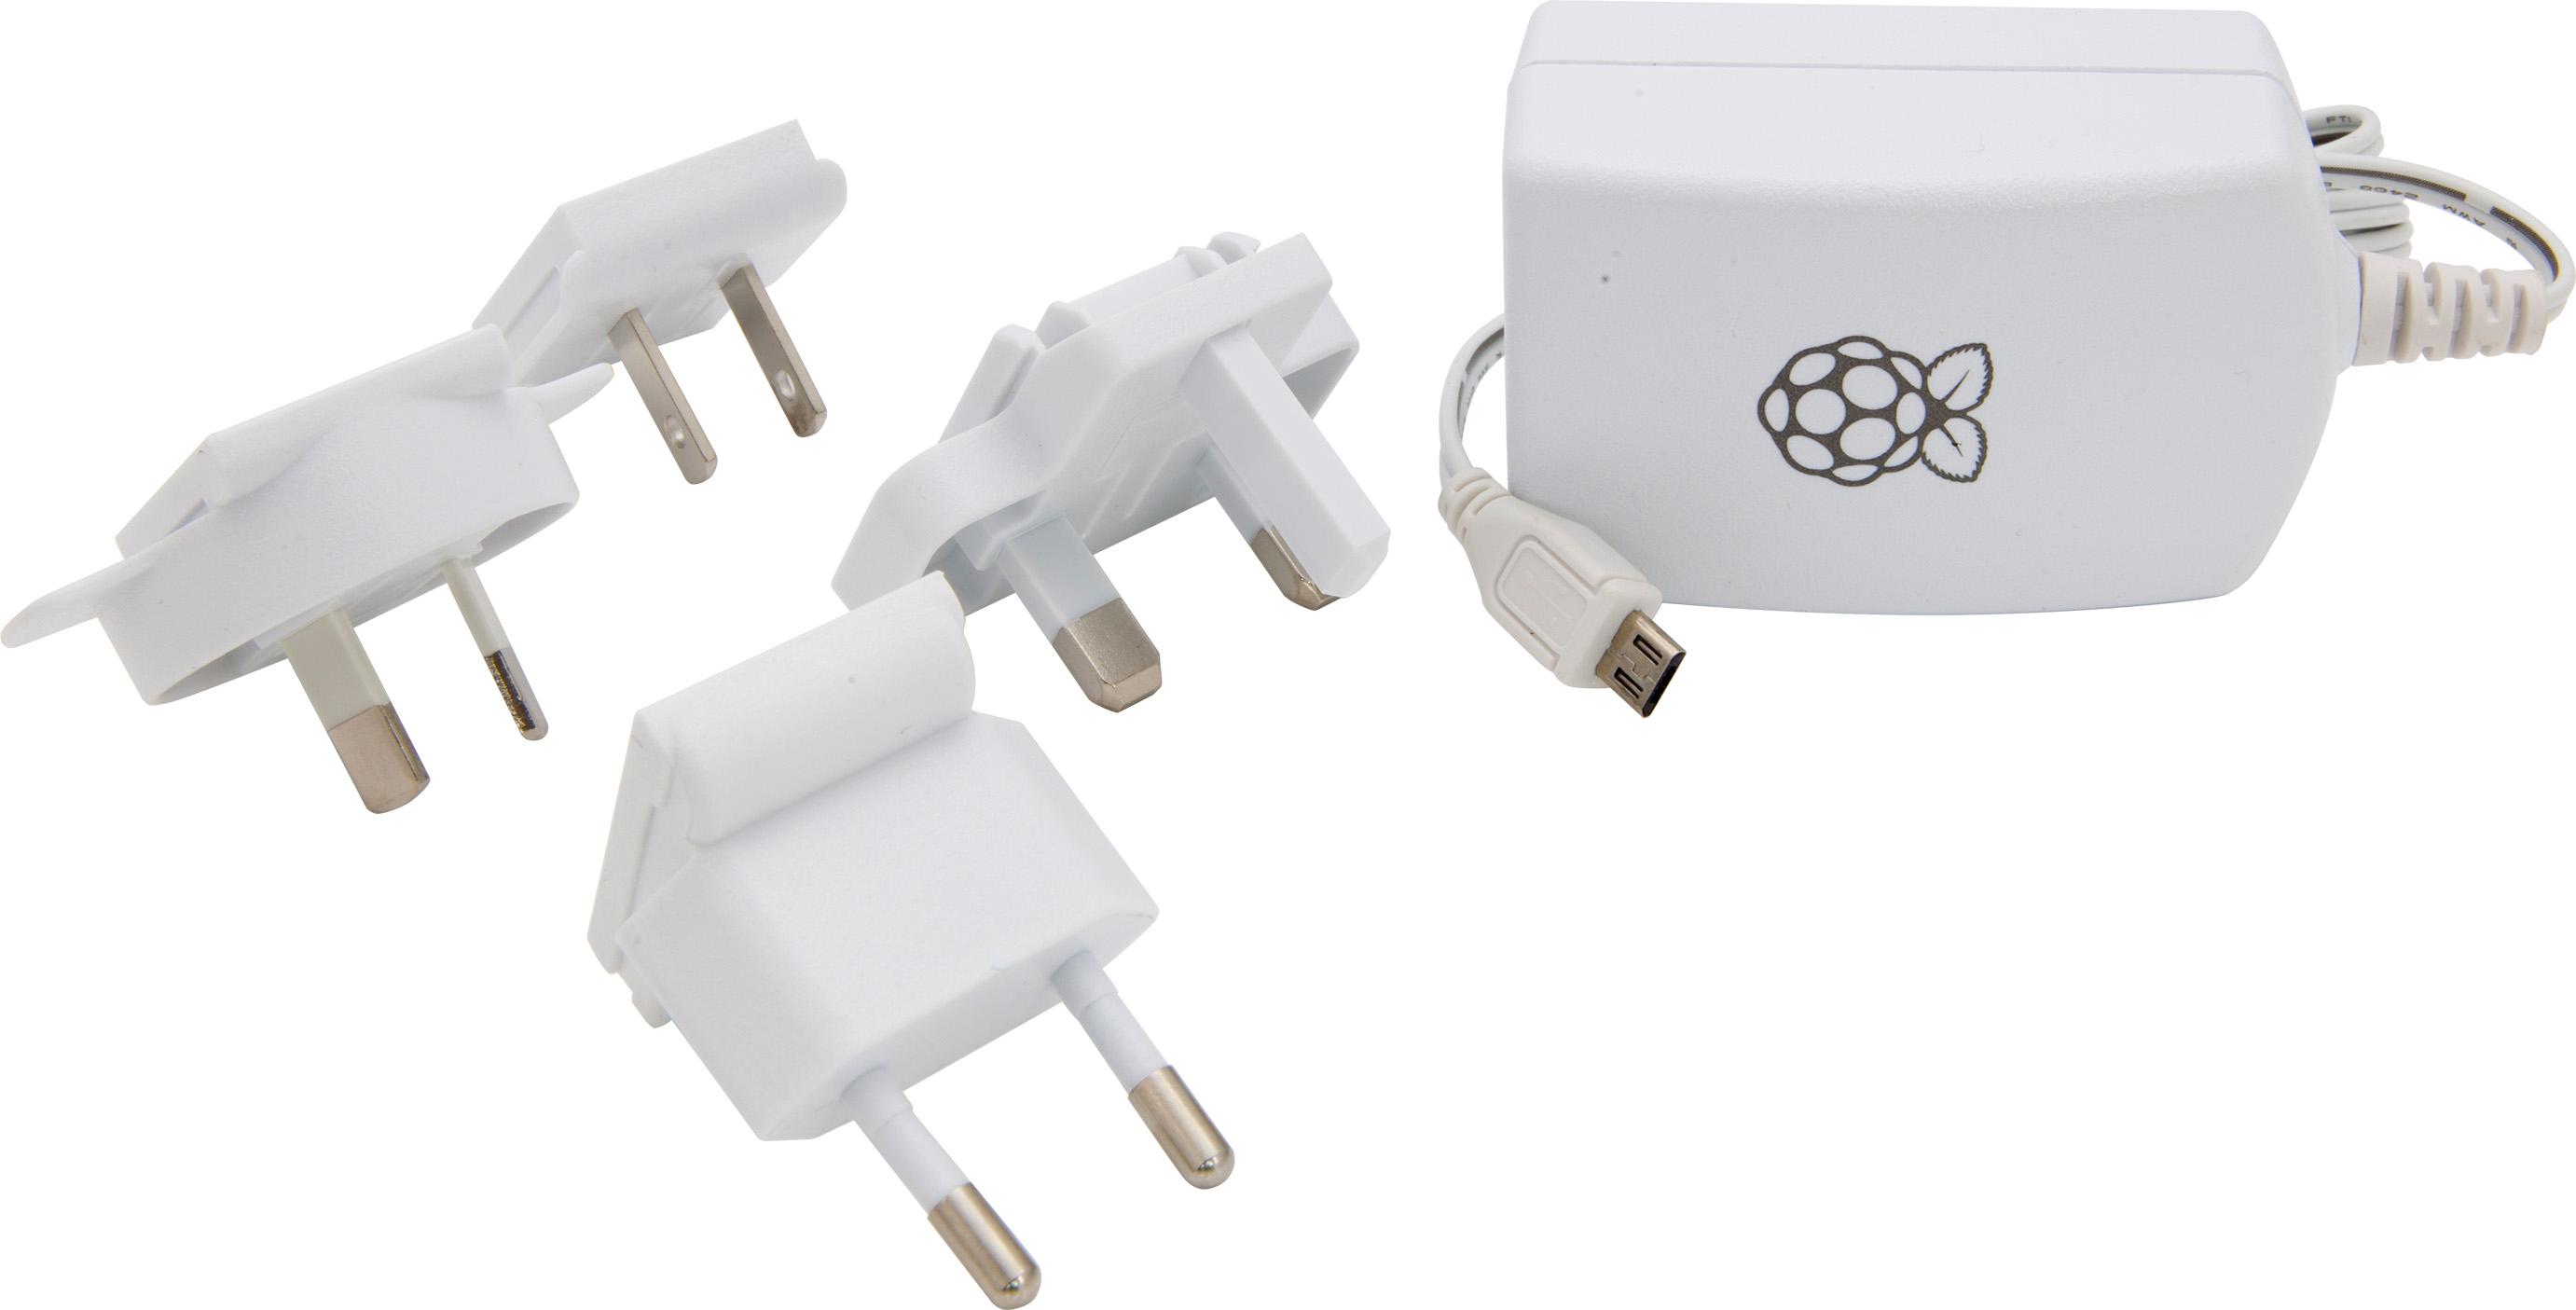 Stontronics 2.5A Micro-USB Power Supply for Raspberry Pi 3 - T5875DV